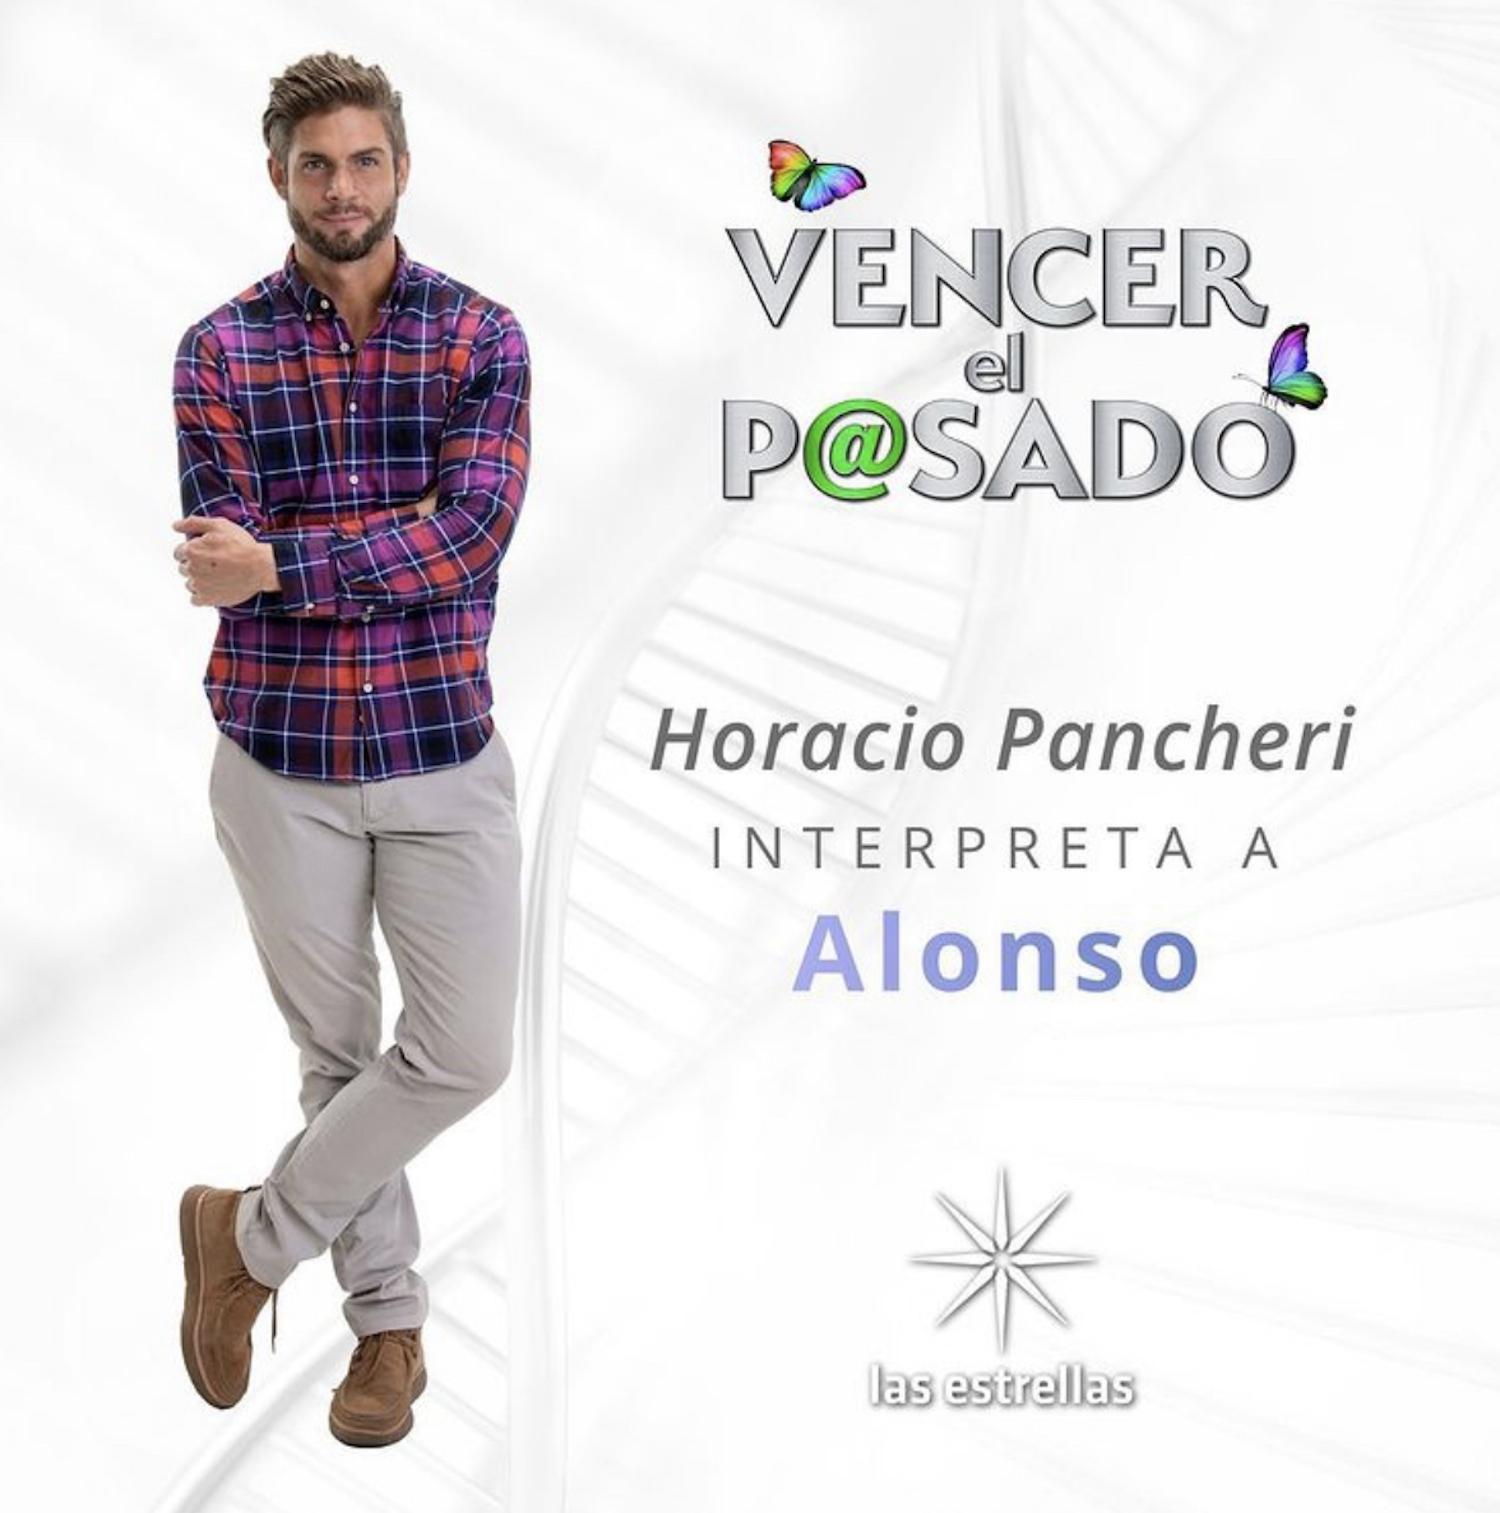 Horacio Pancheri